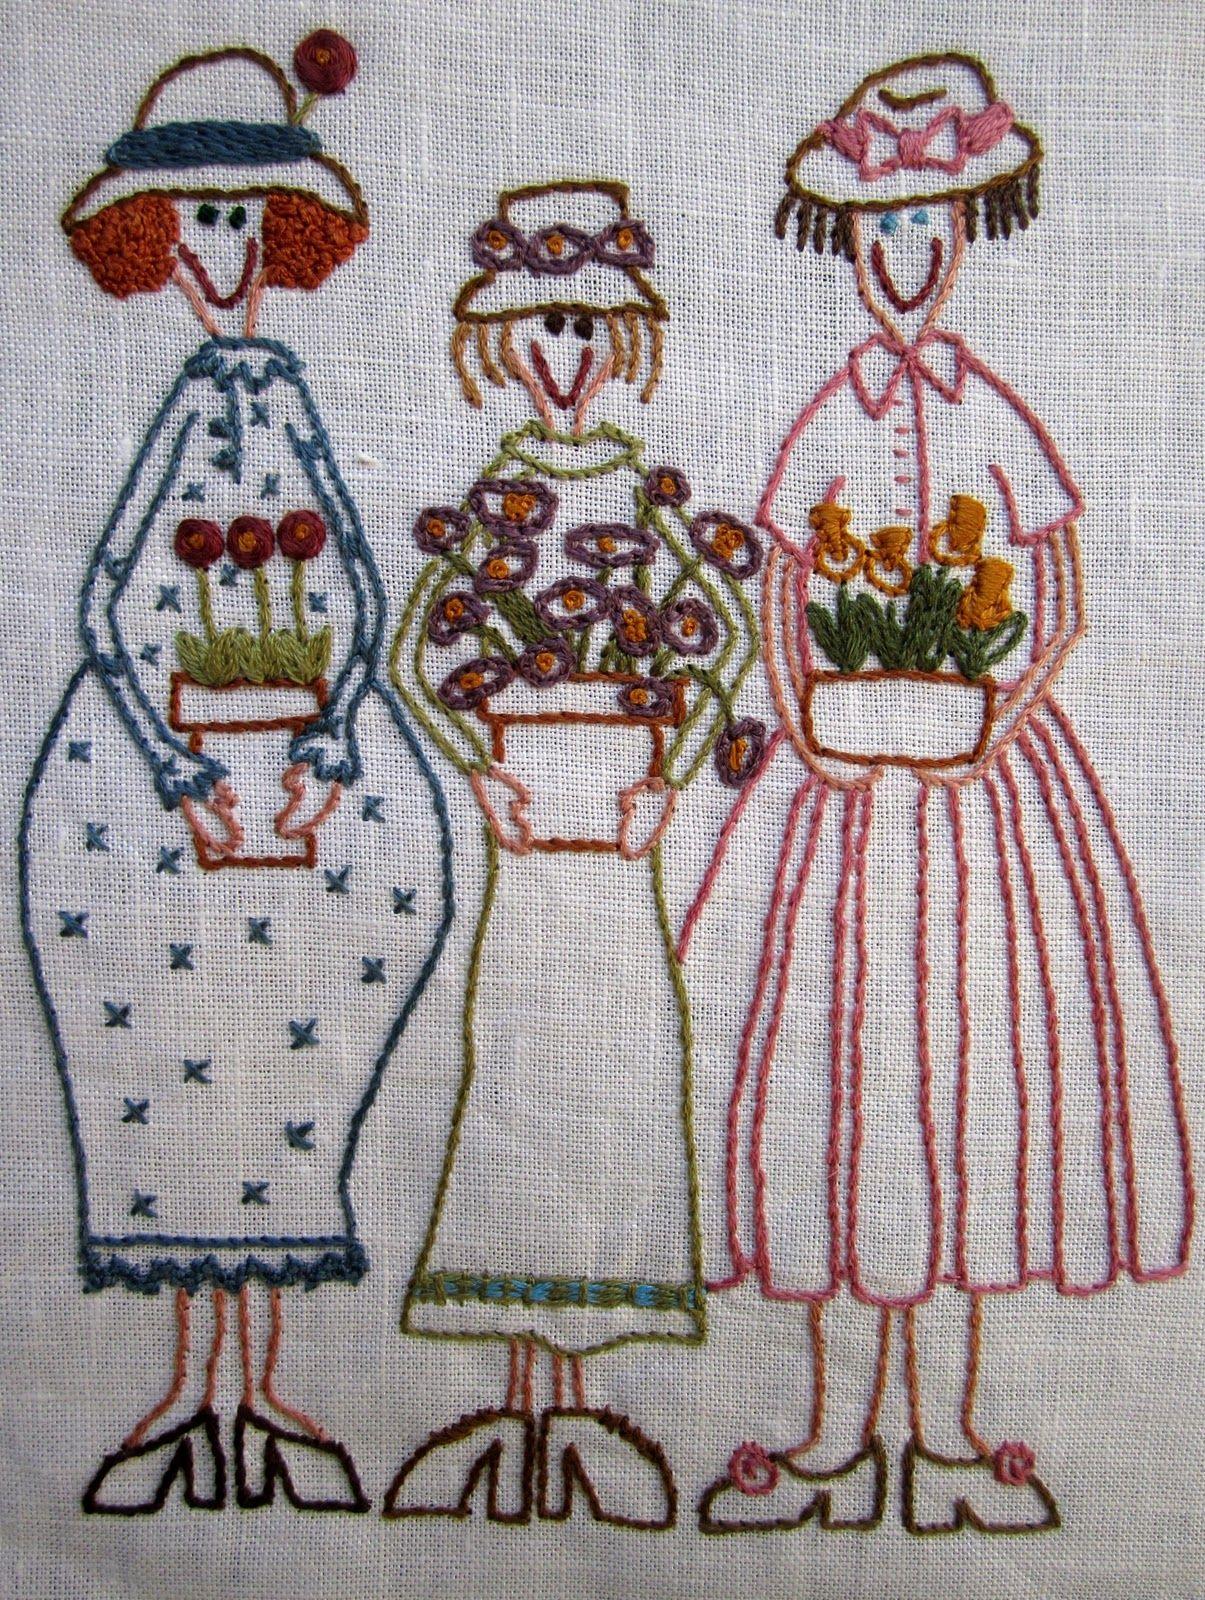 Stitch-A-Long - - - - - | Patchwork bags | Pinterest | Bordado, Arte ...